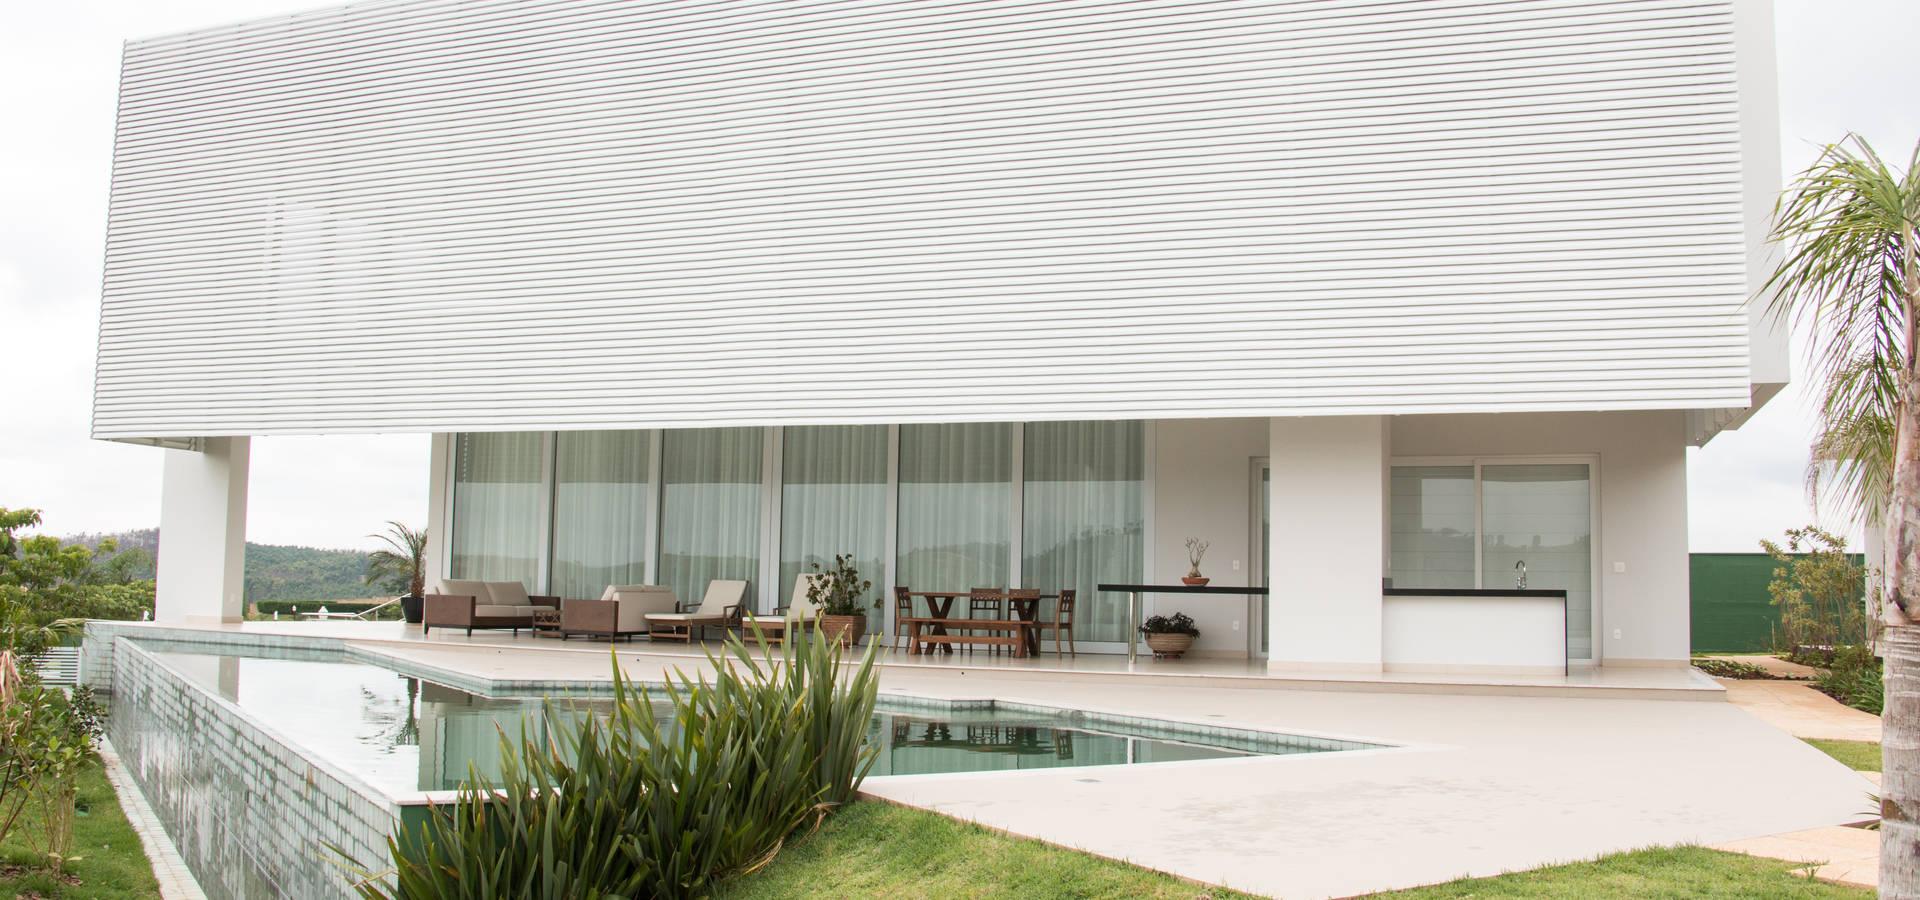 Araujo Moraes Engenharia Arquitetura